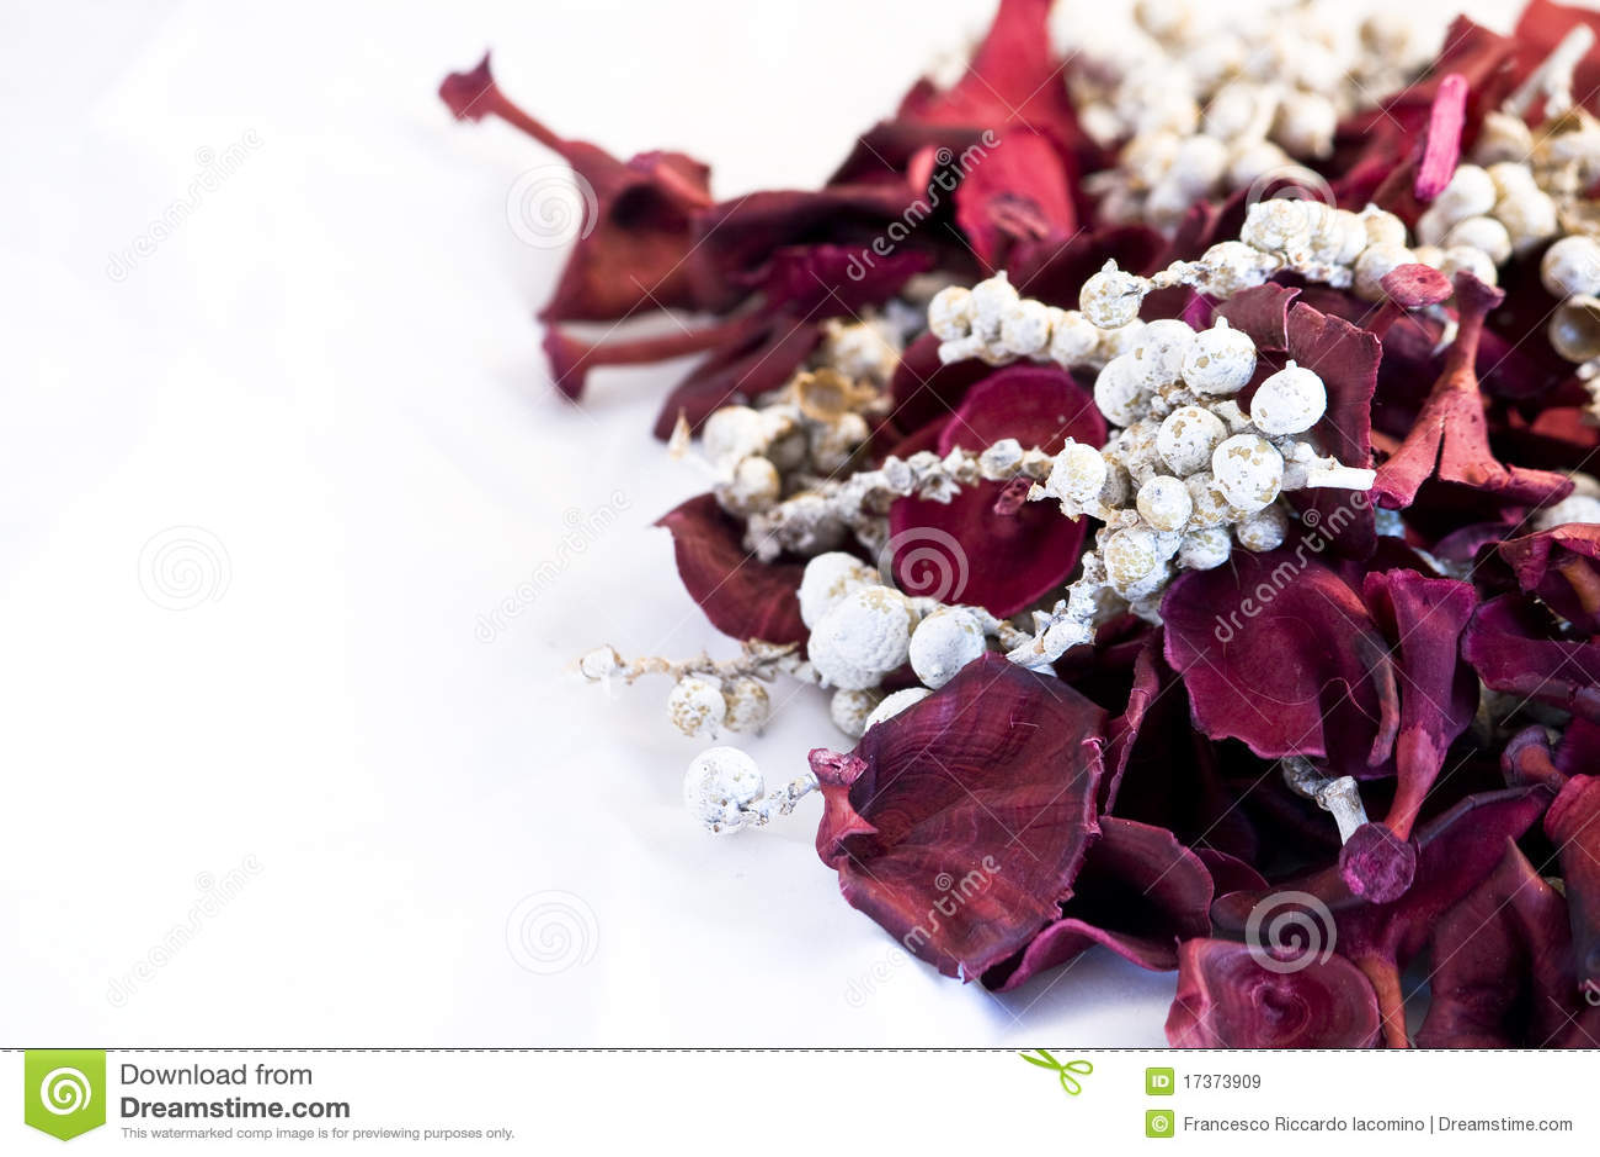 Het welriekend mengsel van gedroogde bloemen en kruidenbloemen van Kerstmis op witte achtergrond